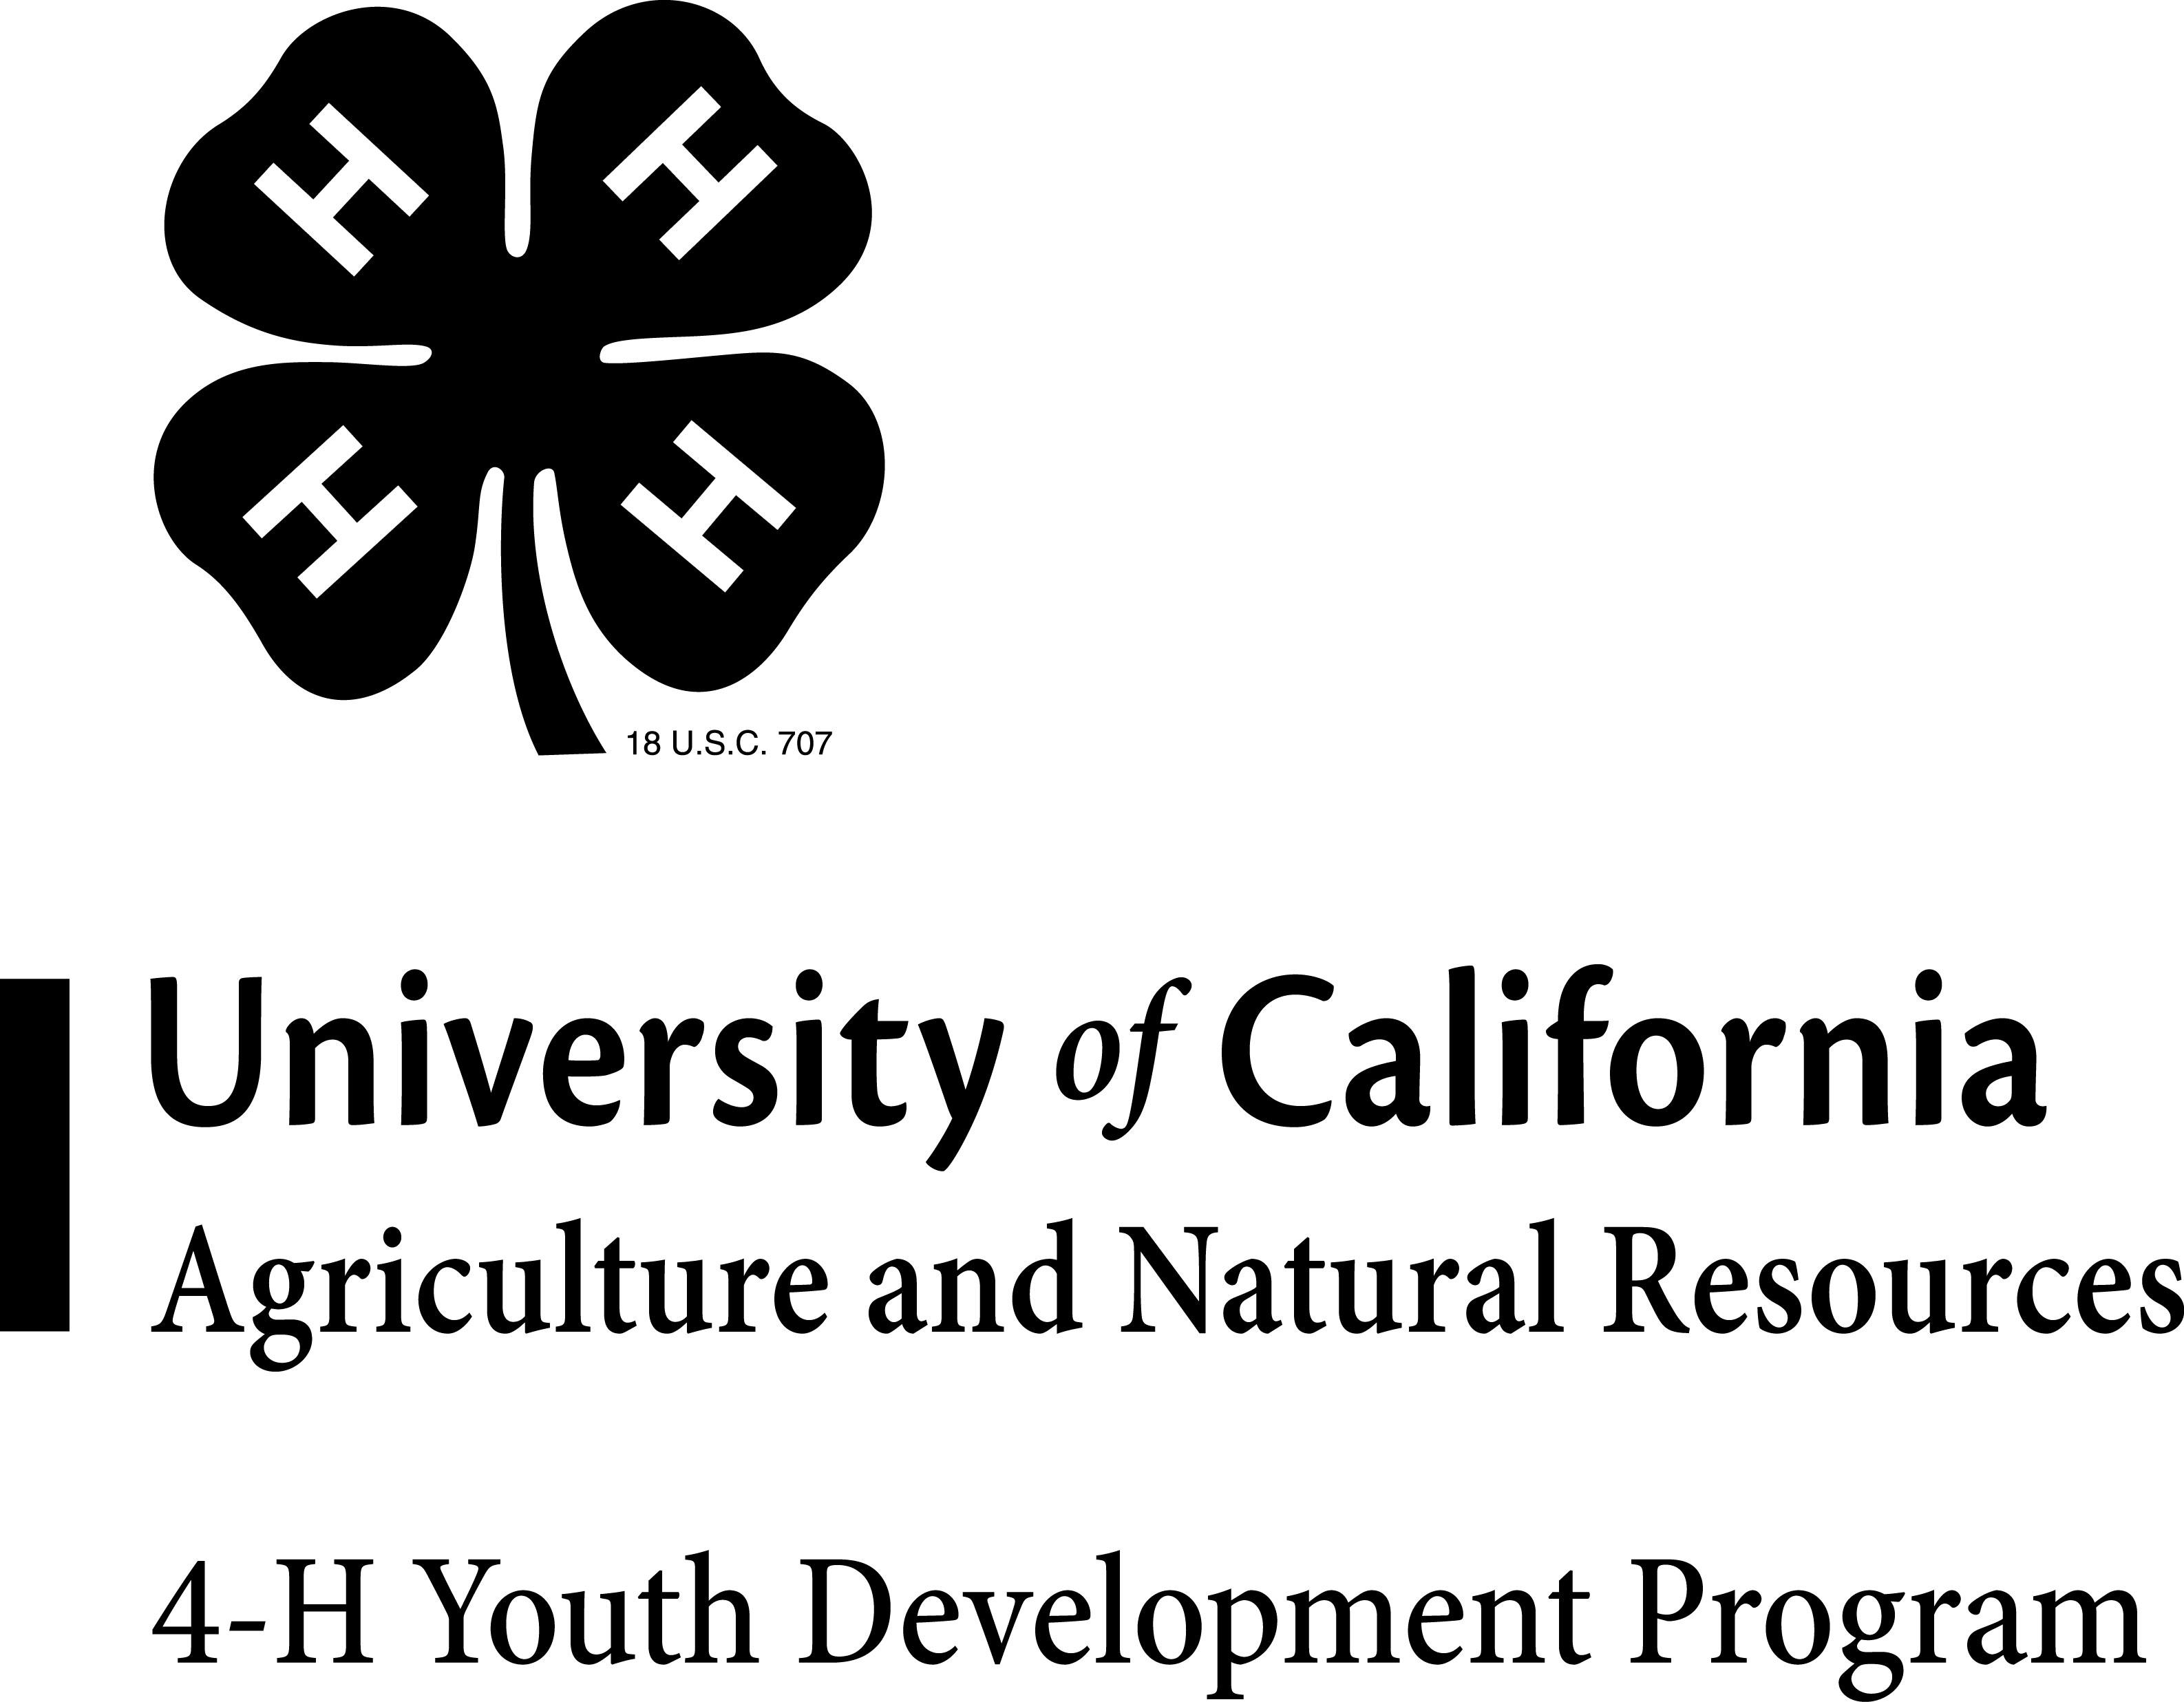 Uc Anr 4 H Branding Toolkit Uc 4 H Youth Development Program